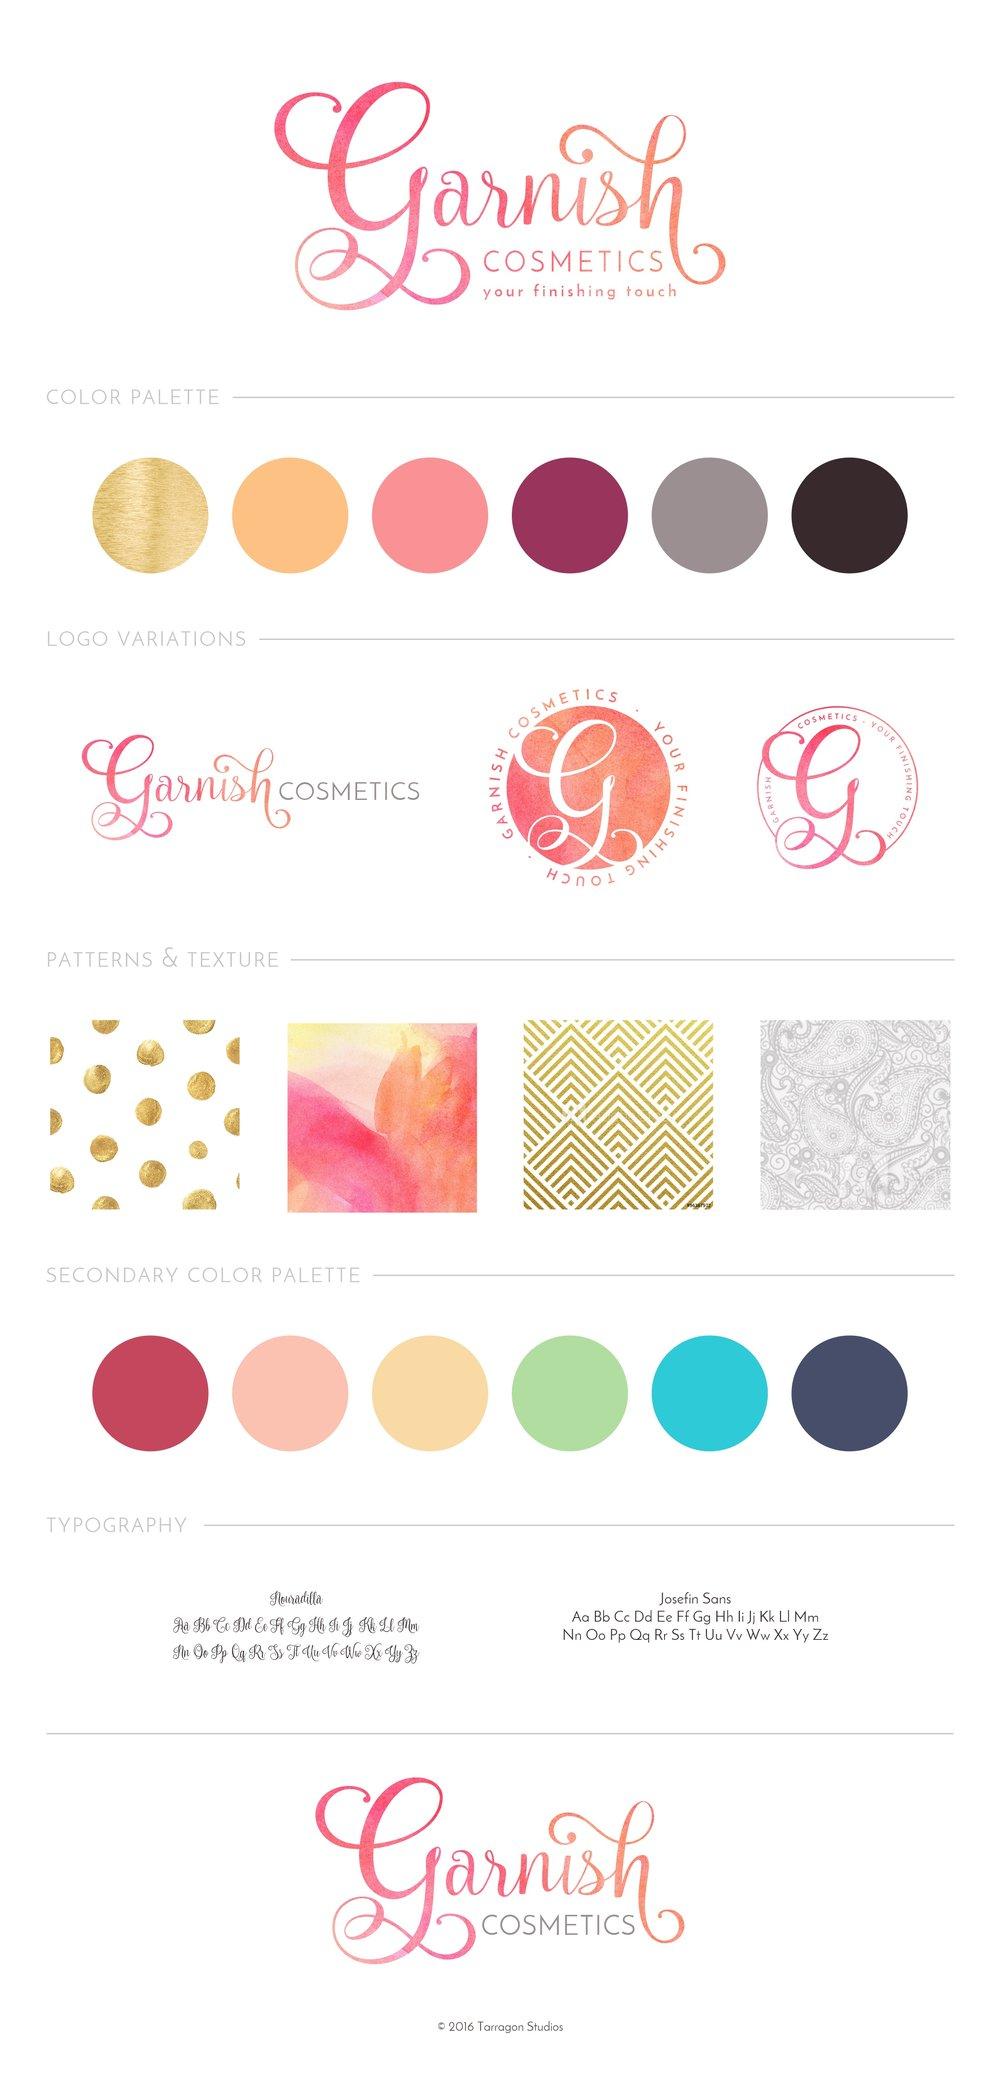 Garnish Cosmetics, LLC Brand Style Guide designed by Tarragon Studios